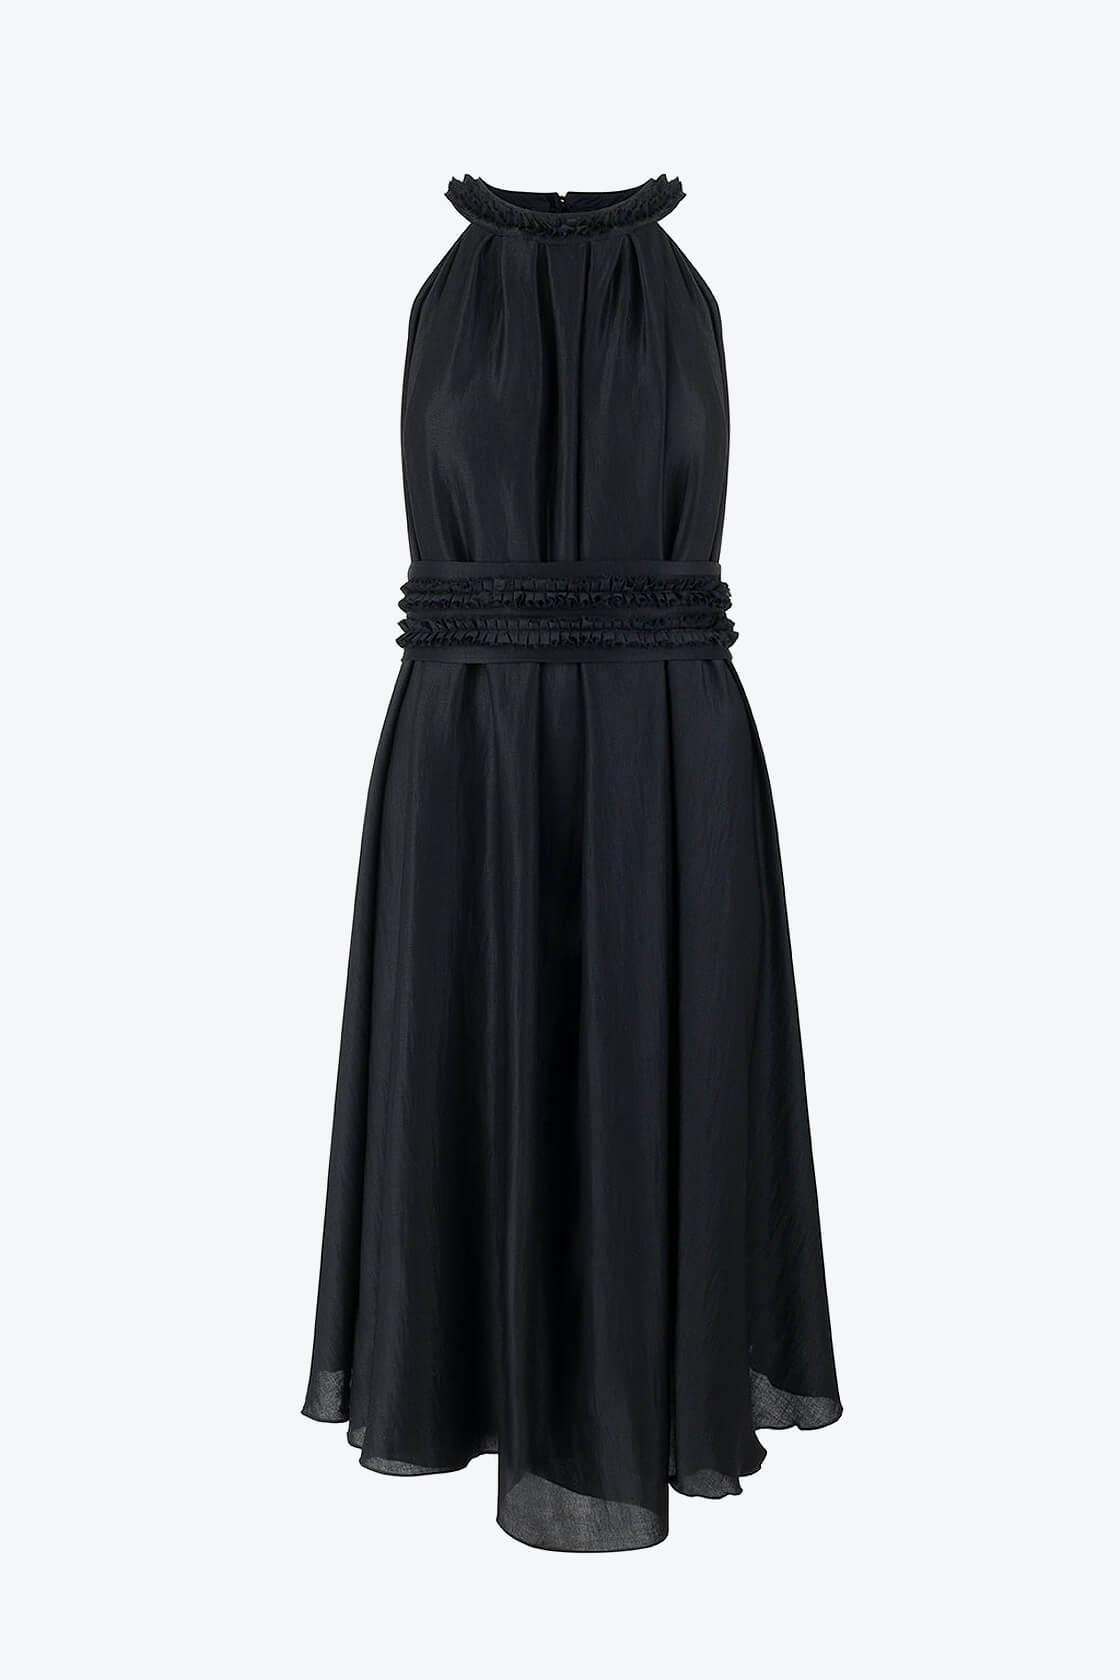 OL100002650 Olivera Sleeveless Cocktail Dress Black1